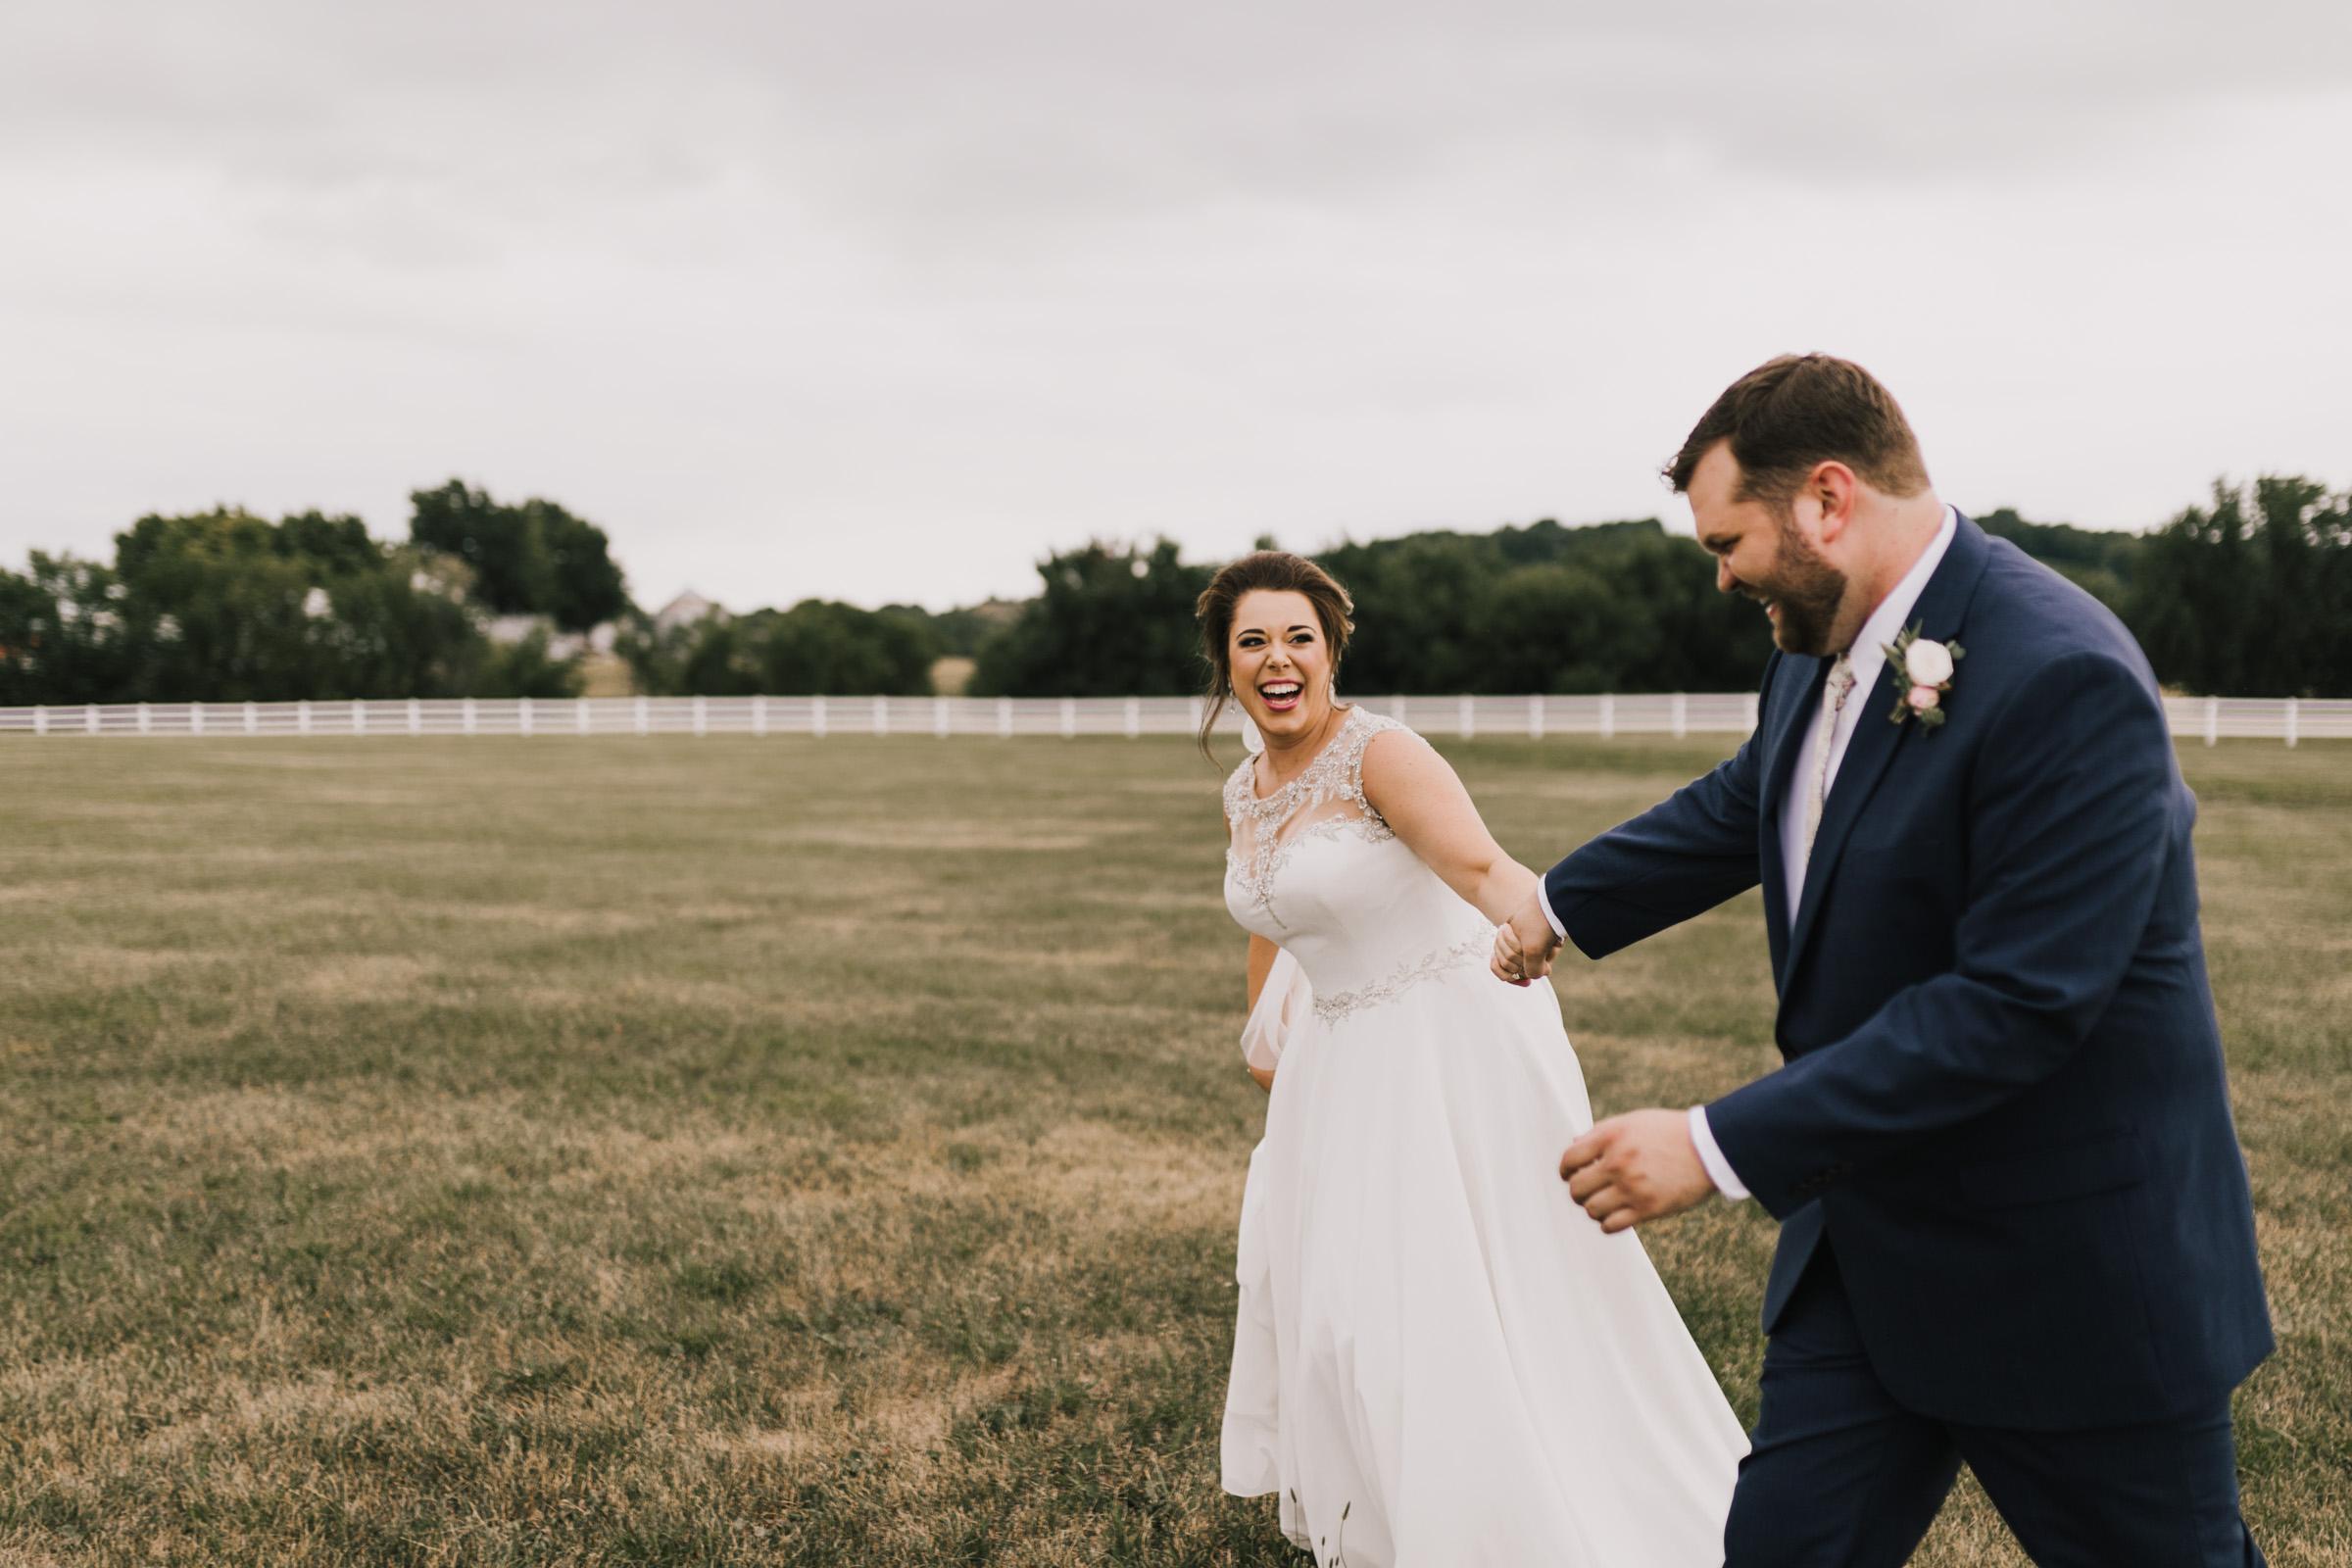 alyssa barletter photography summer odessa missouri wedding kansas city photographer-47.jpg